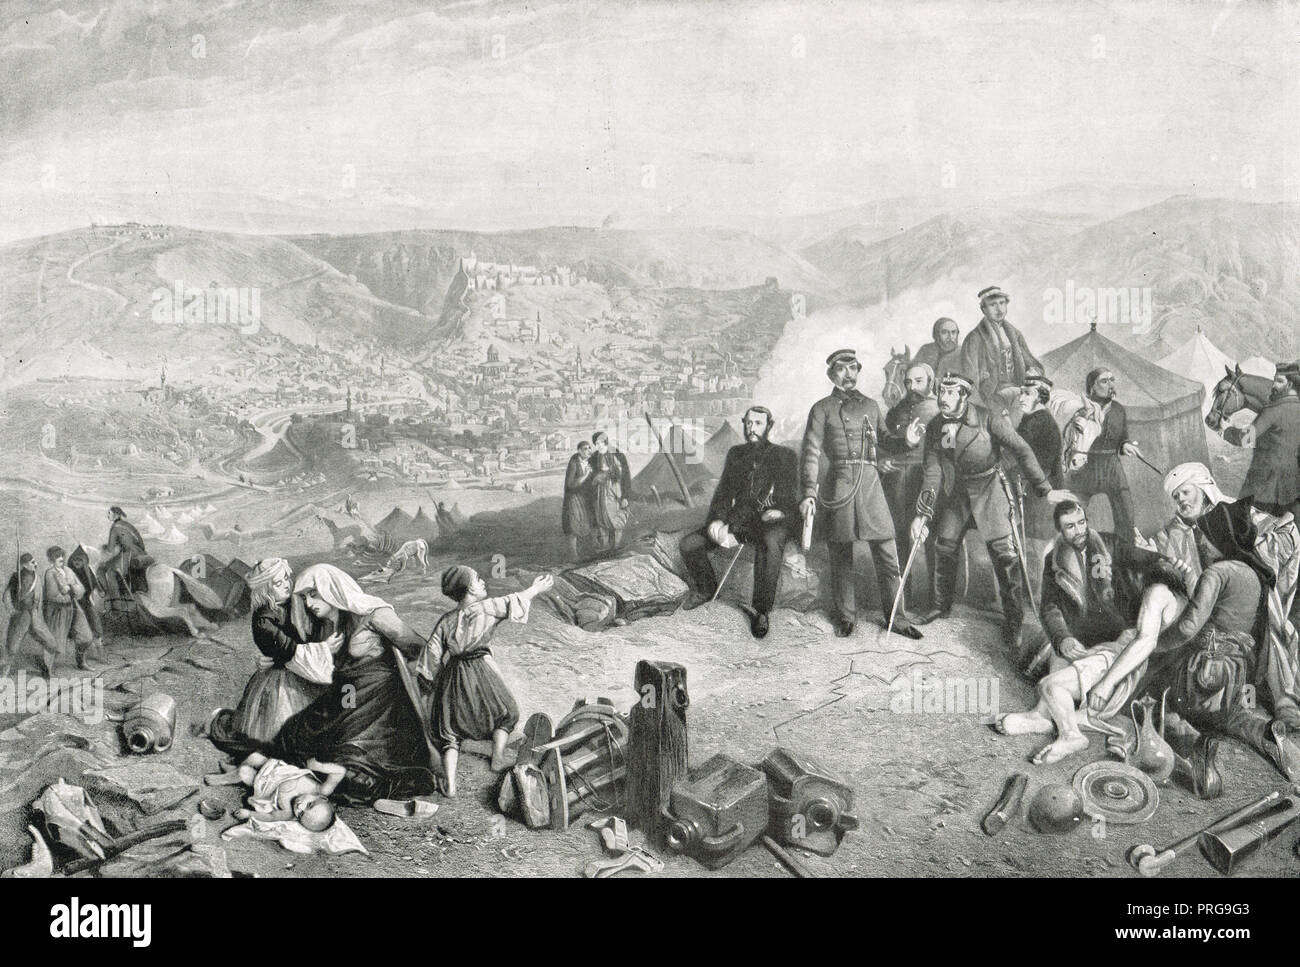 The defence of Kars, June - November 1855, during the Crimean war - Stock Image